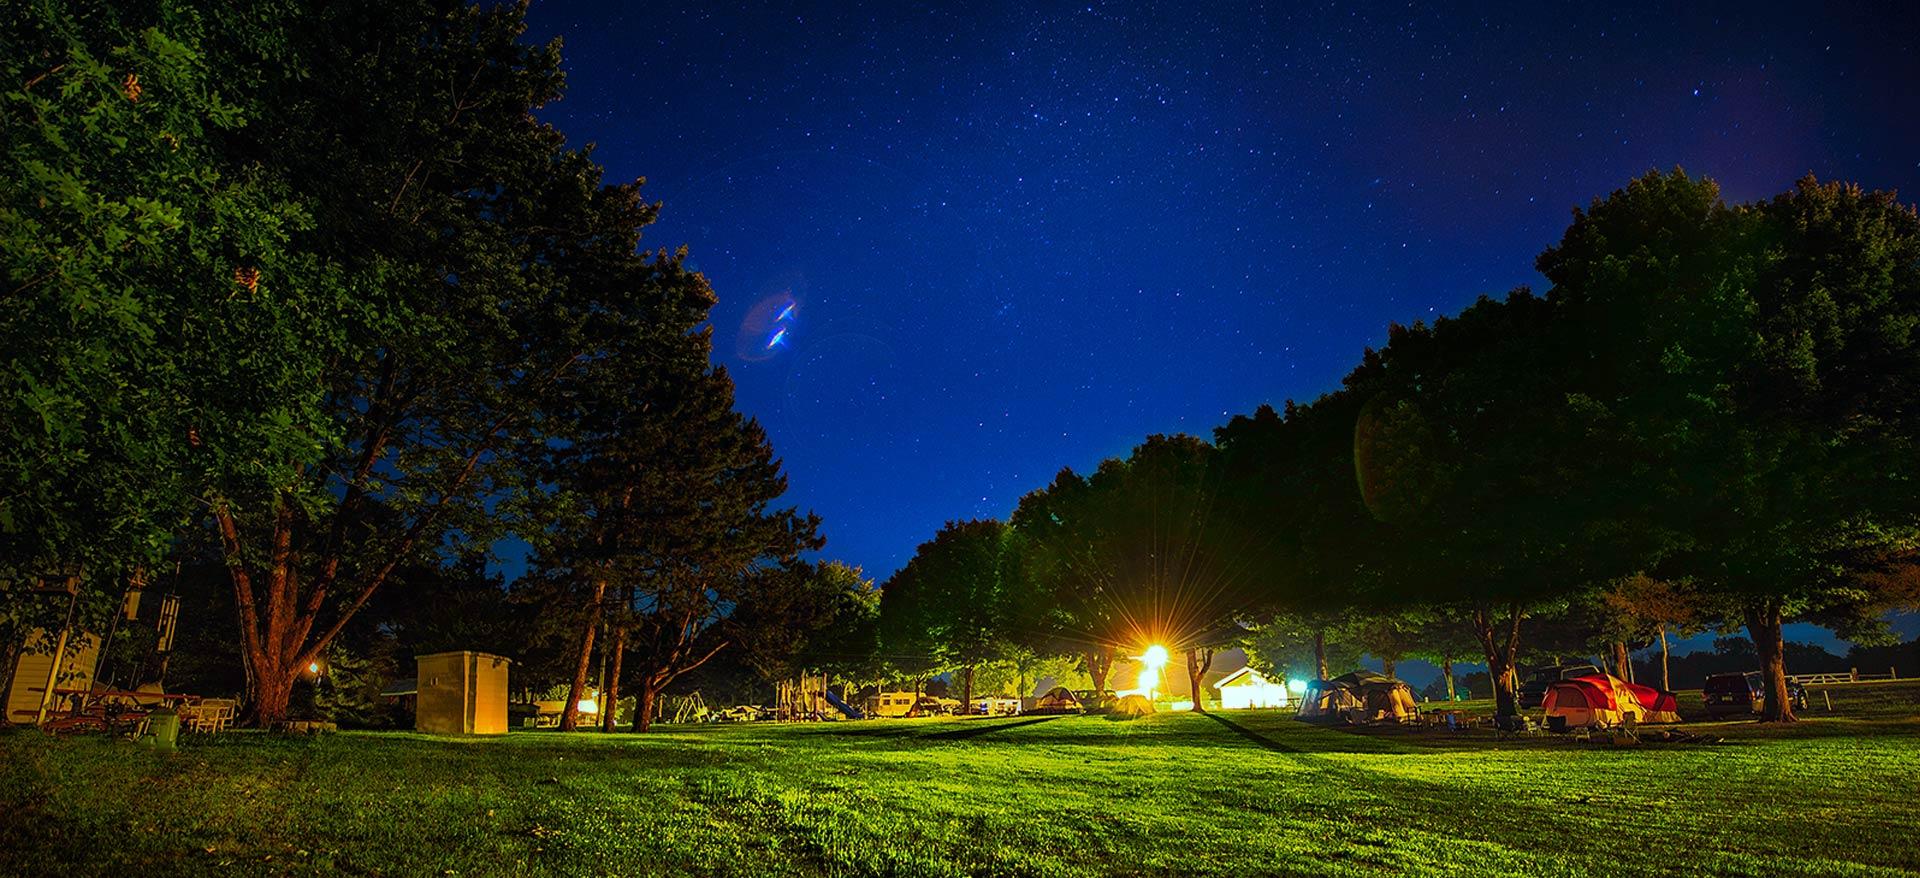 Primitive Camp at Nighttime